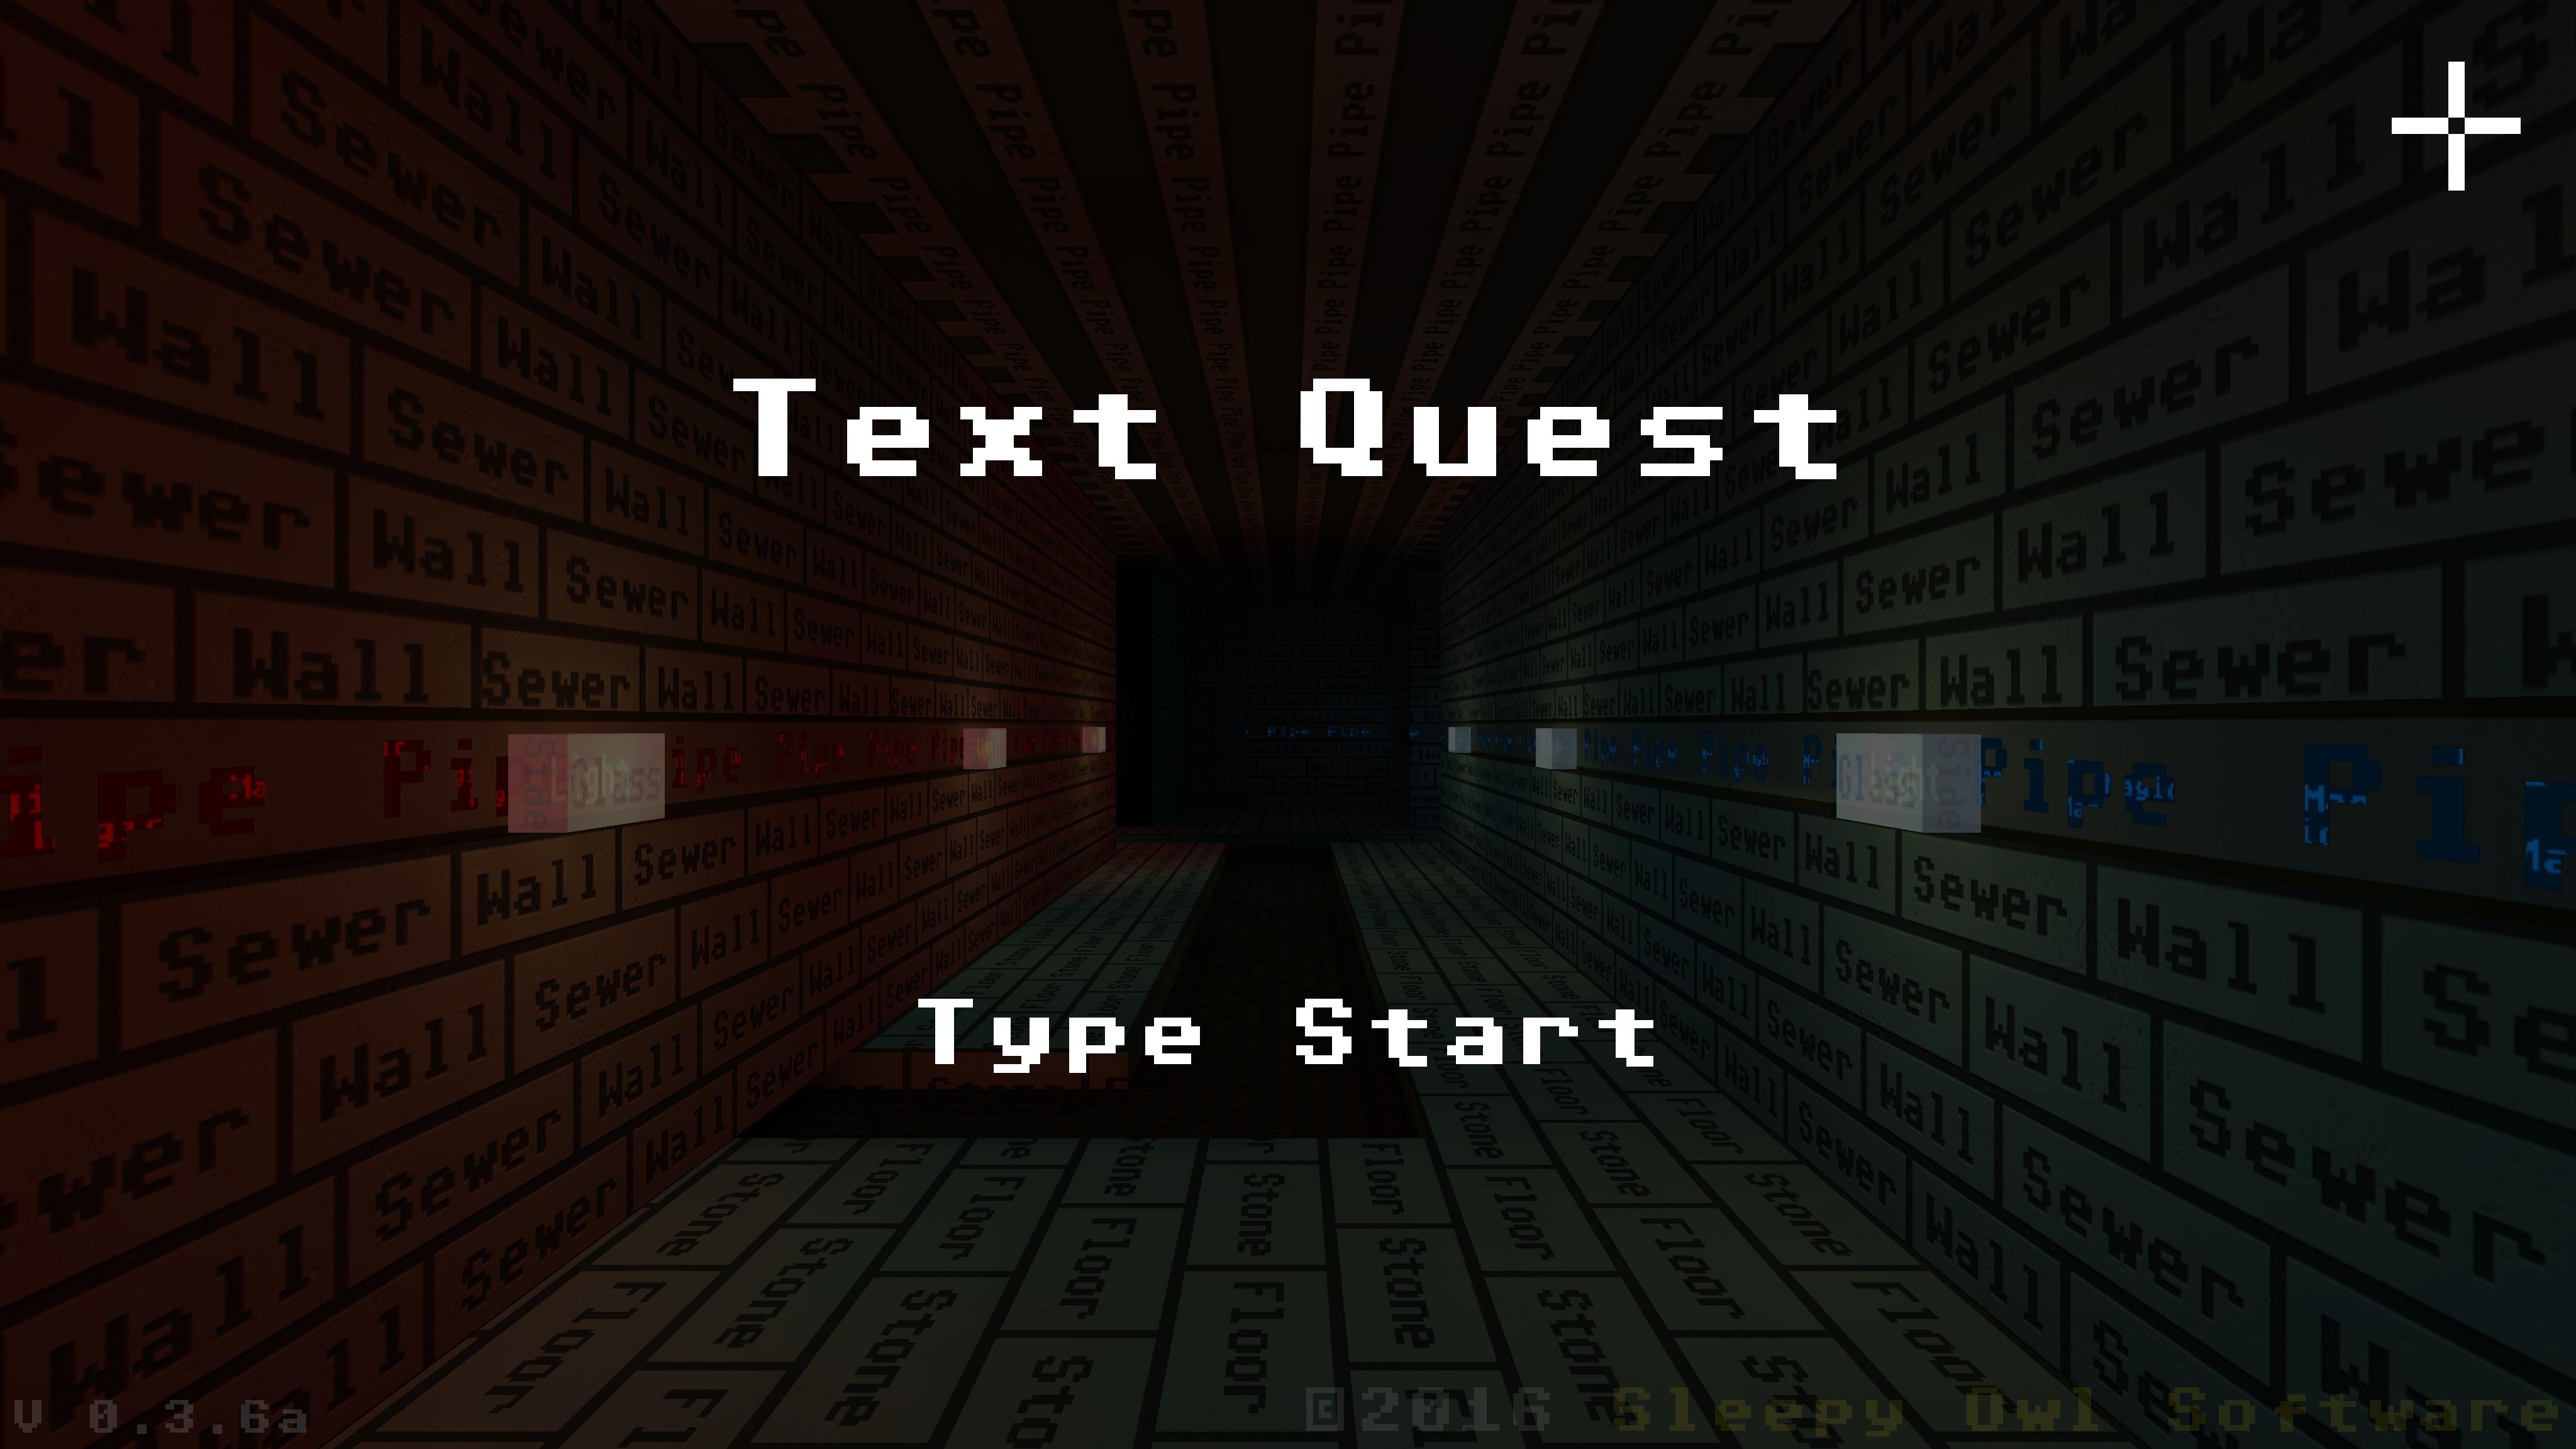 Text Quest